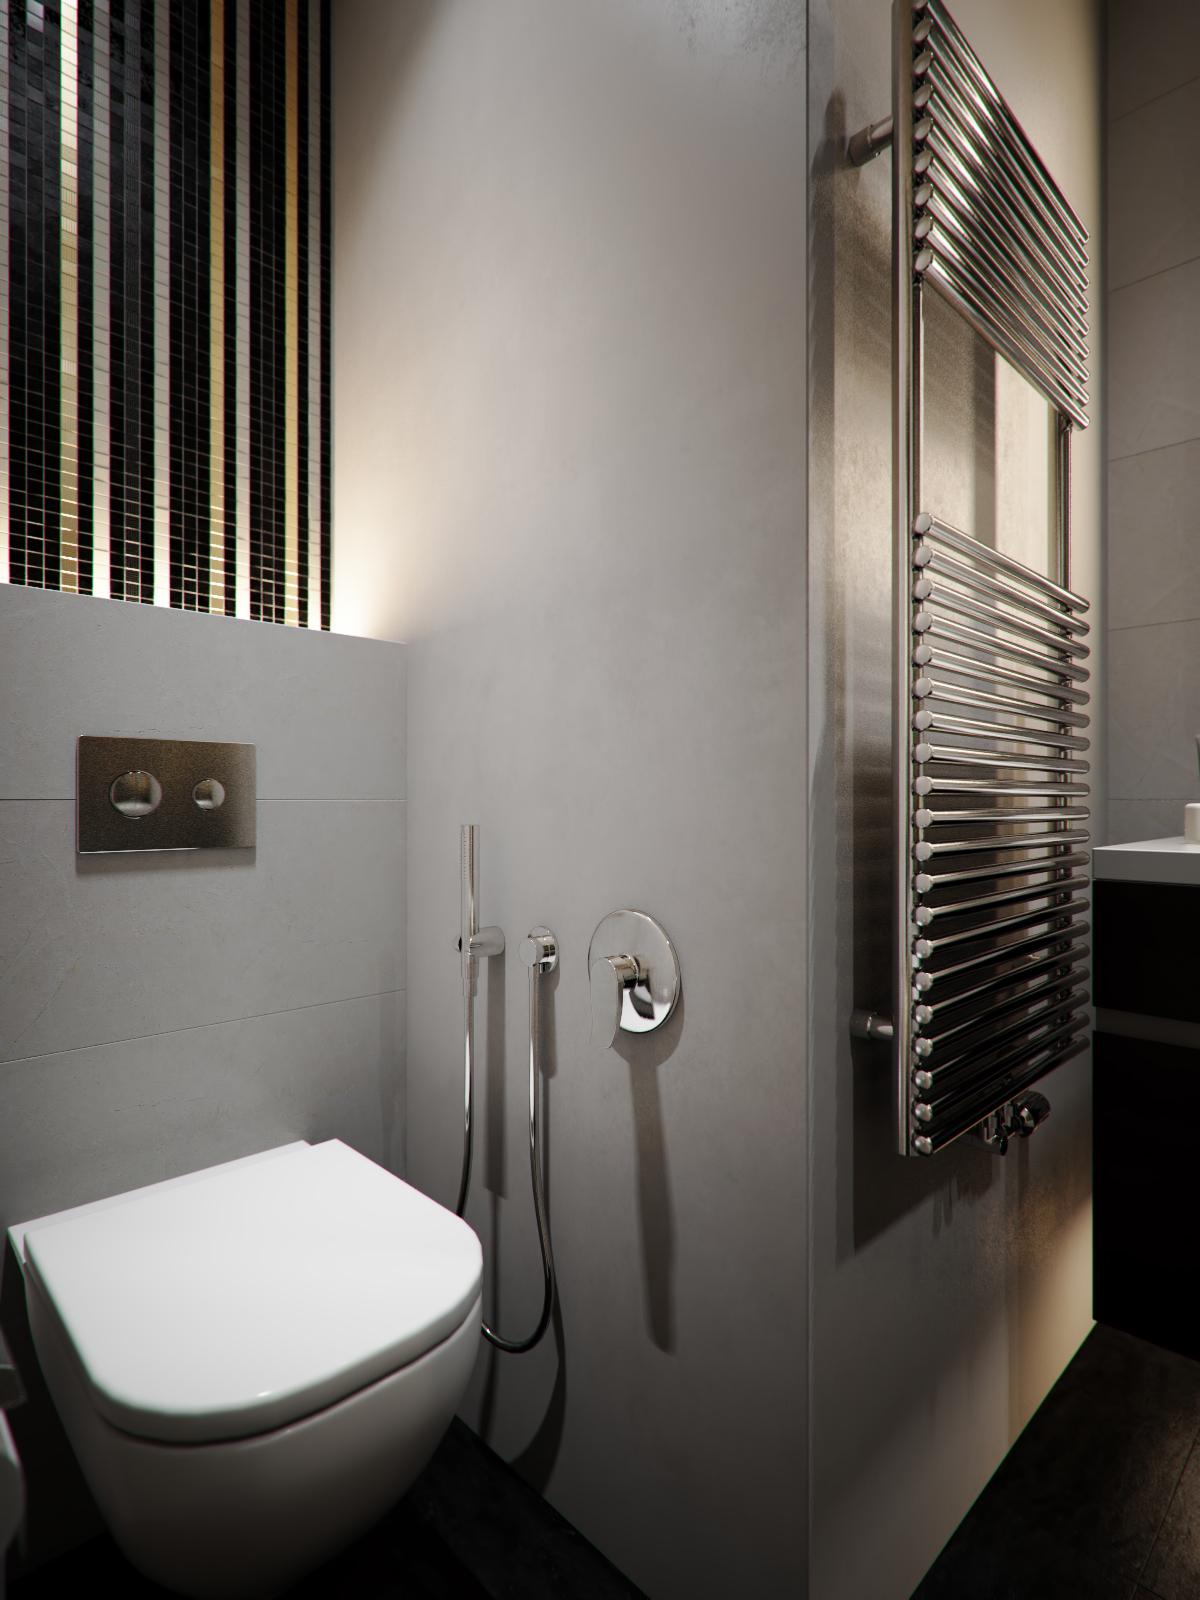 A small apartment with big dreams - Small apartment interior design ...